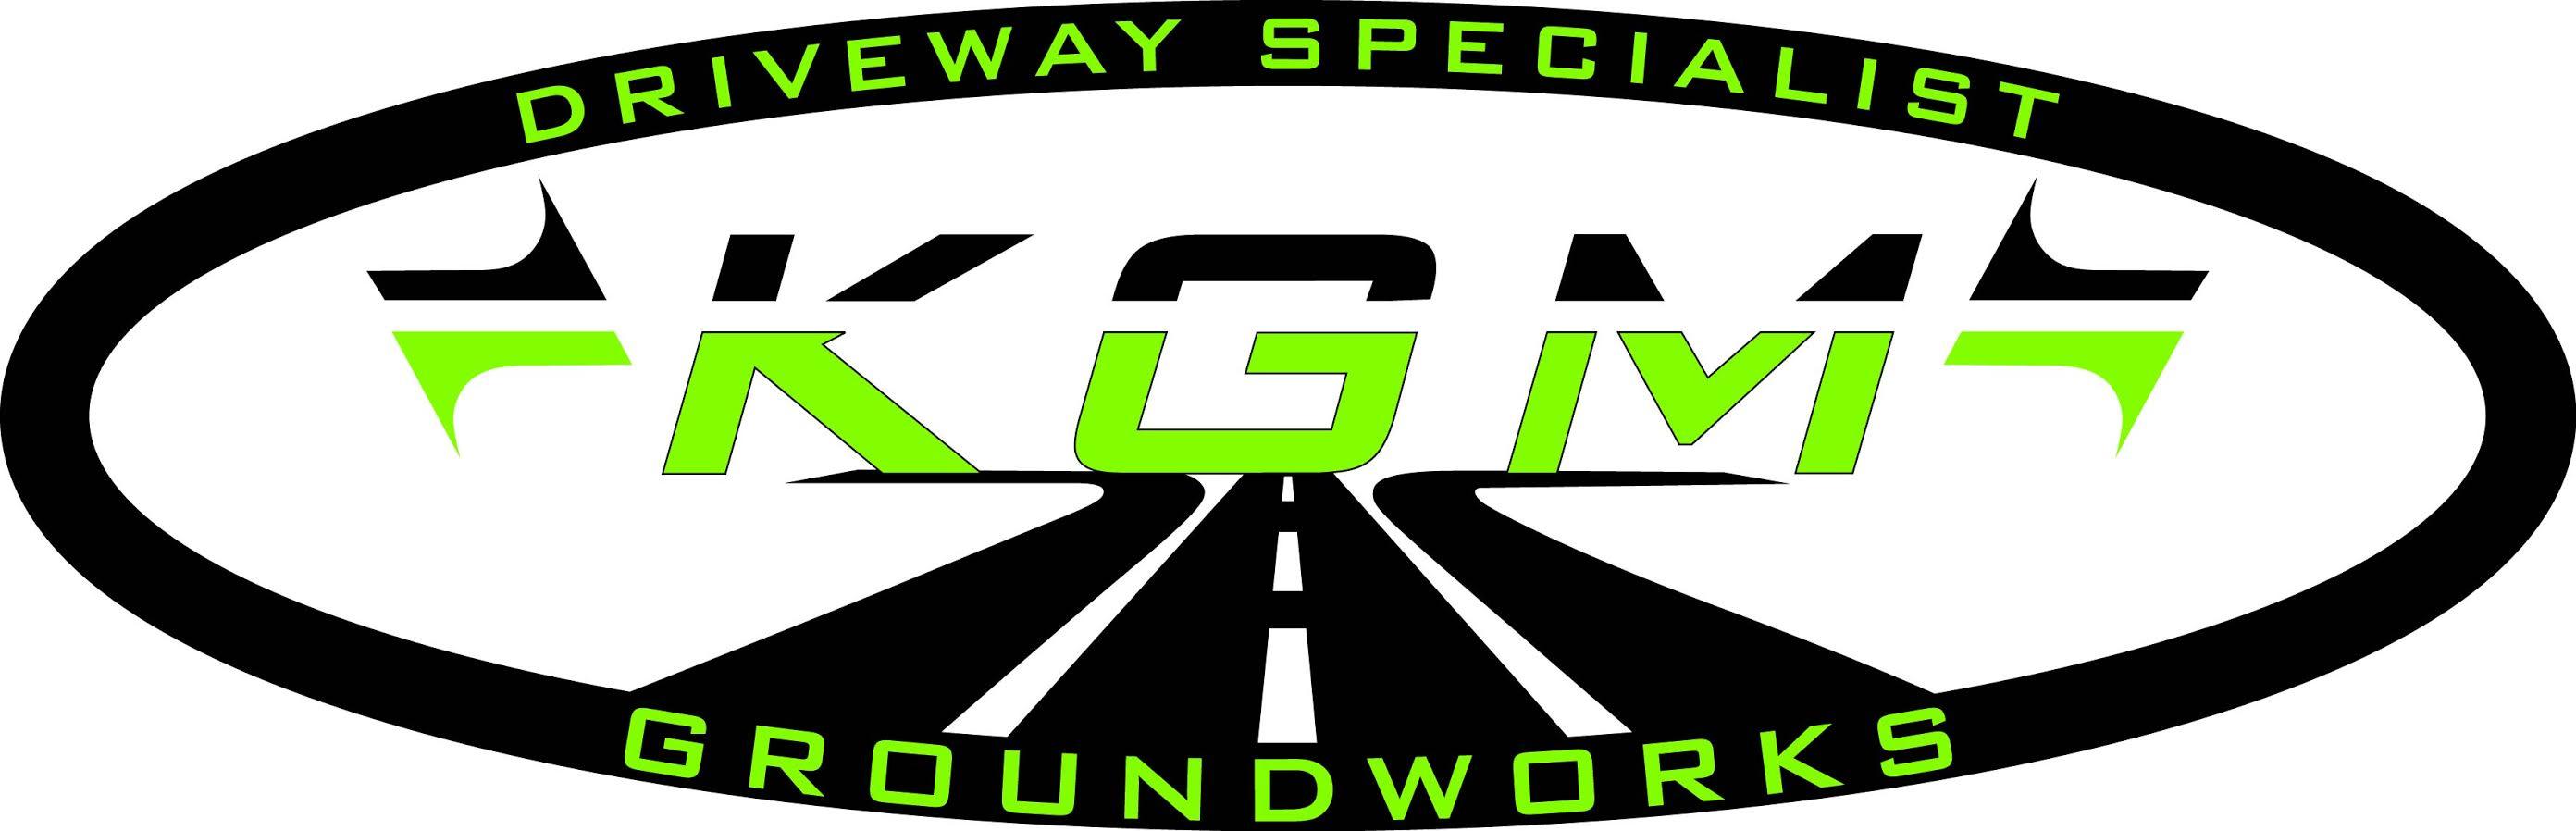 KGM Groundworks